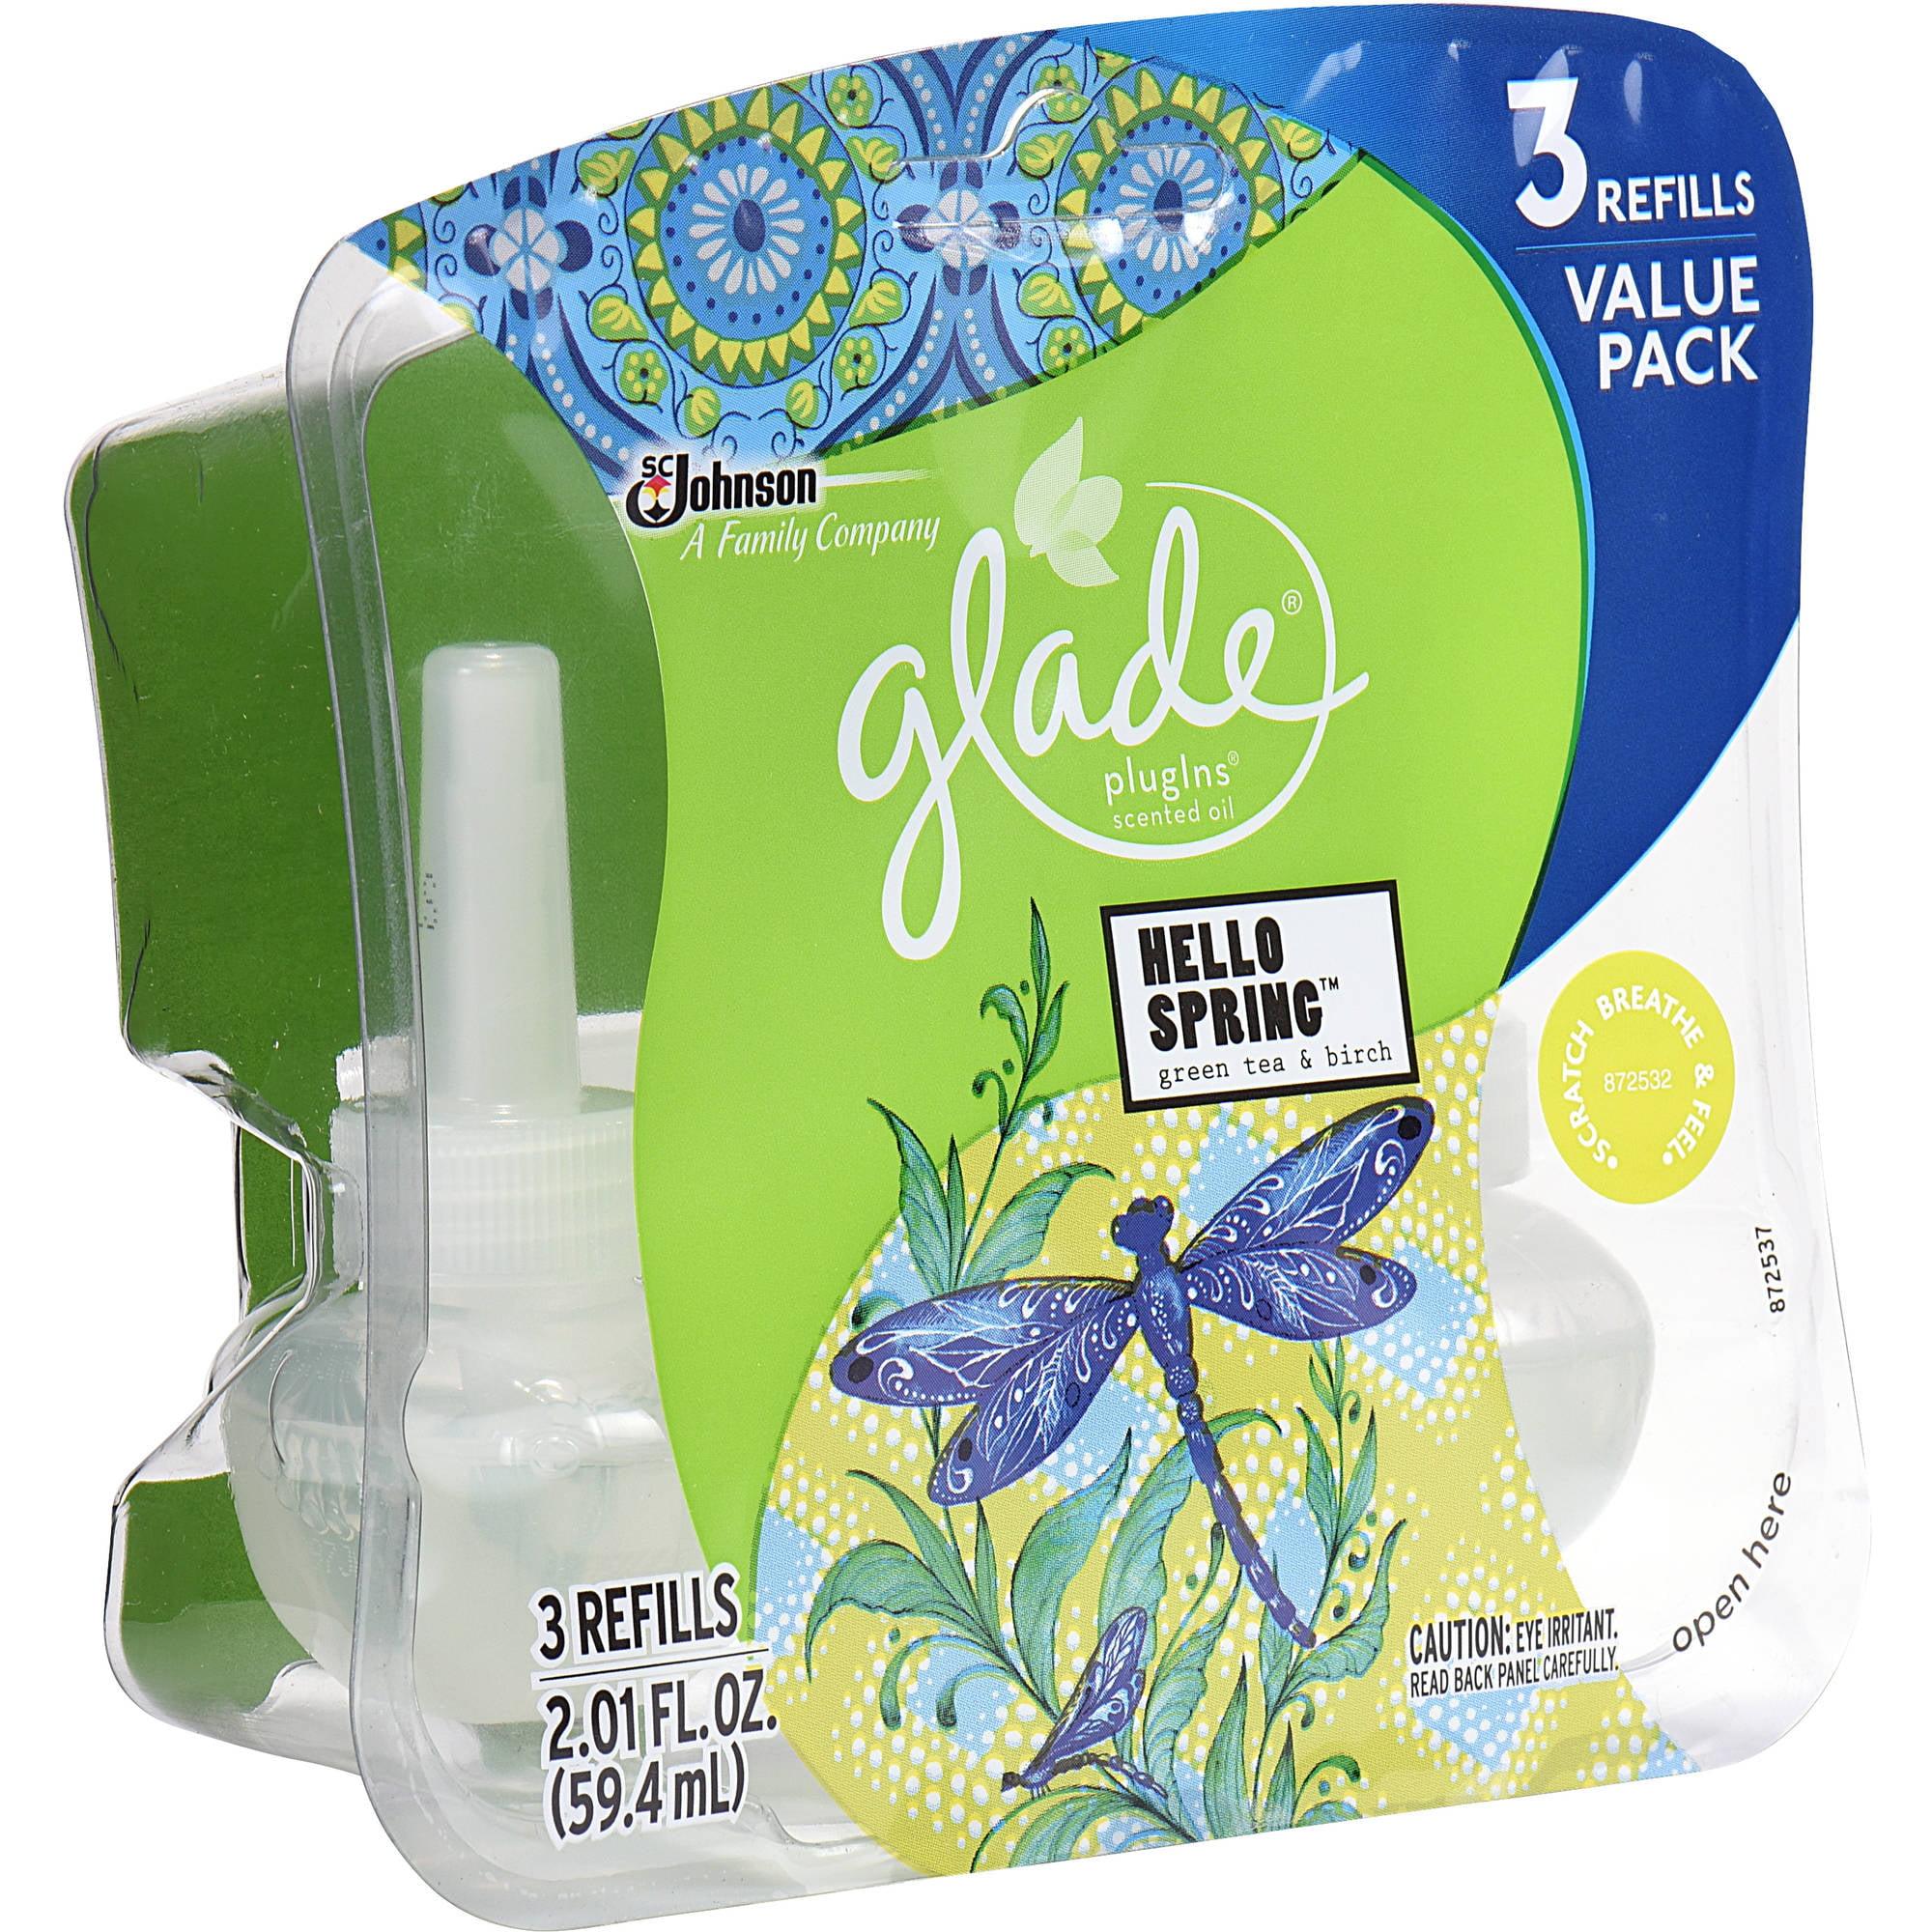 Glade PlugIns Hello Spring Green Tea & Birch Scented Oil Refills, 2.01 fl oz, 3 count